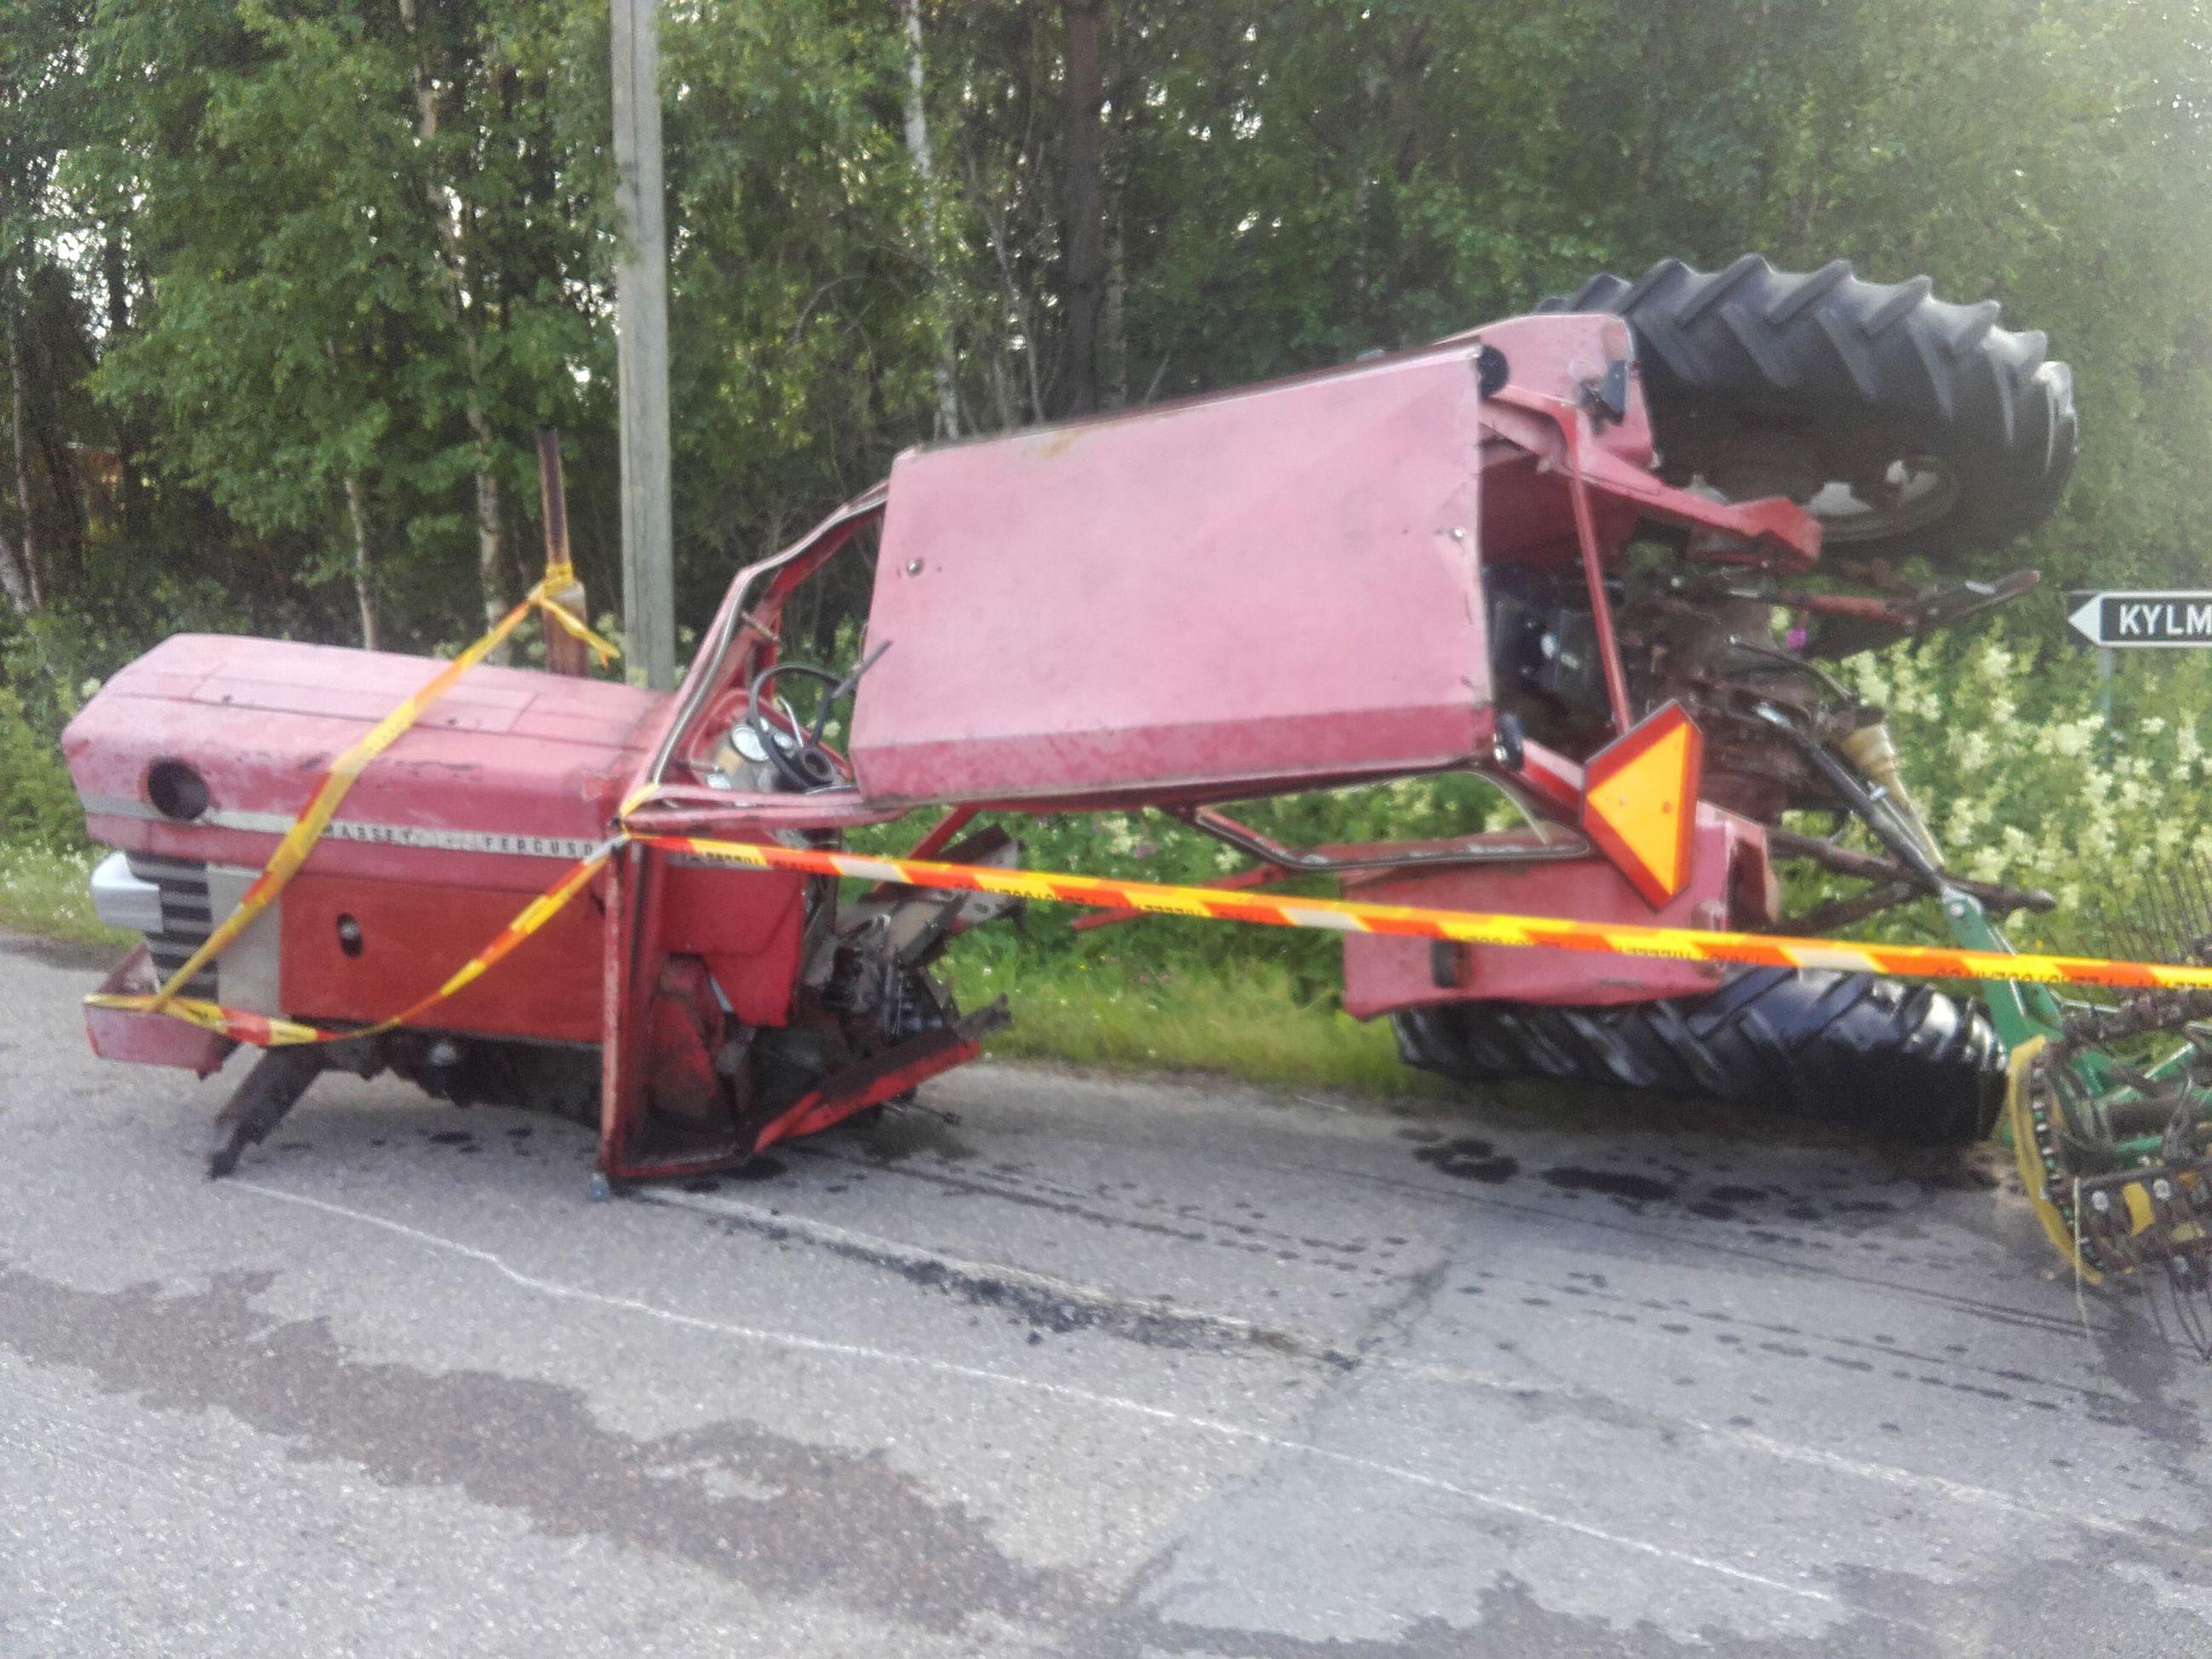 Traktorinkuljettaja